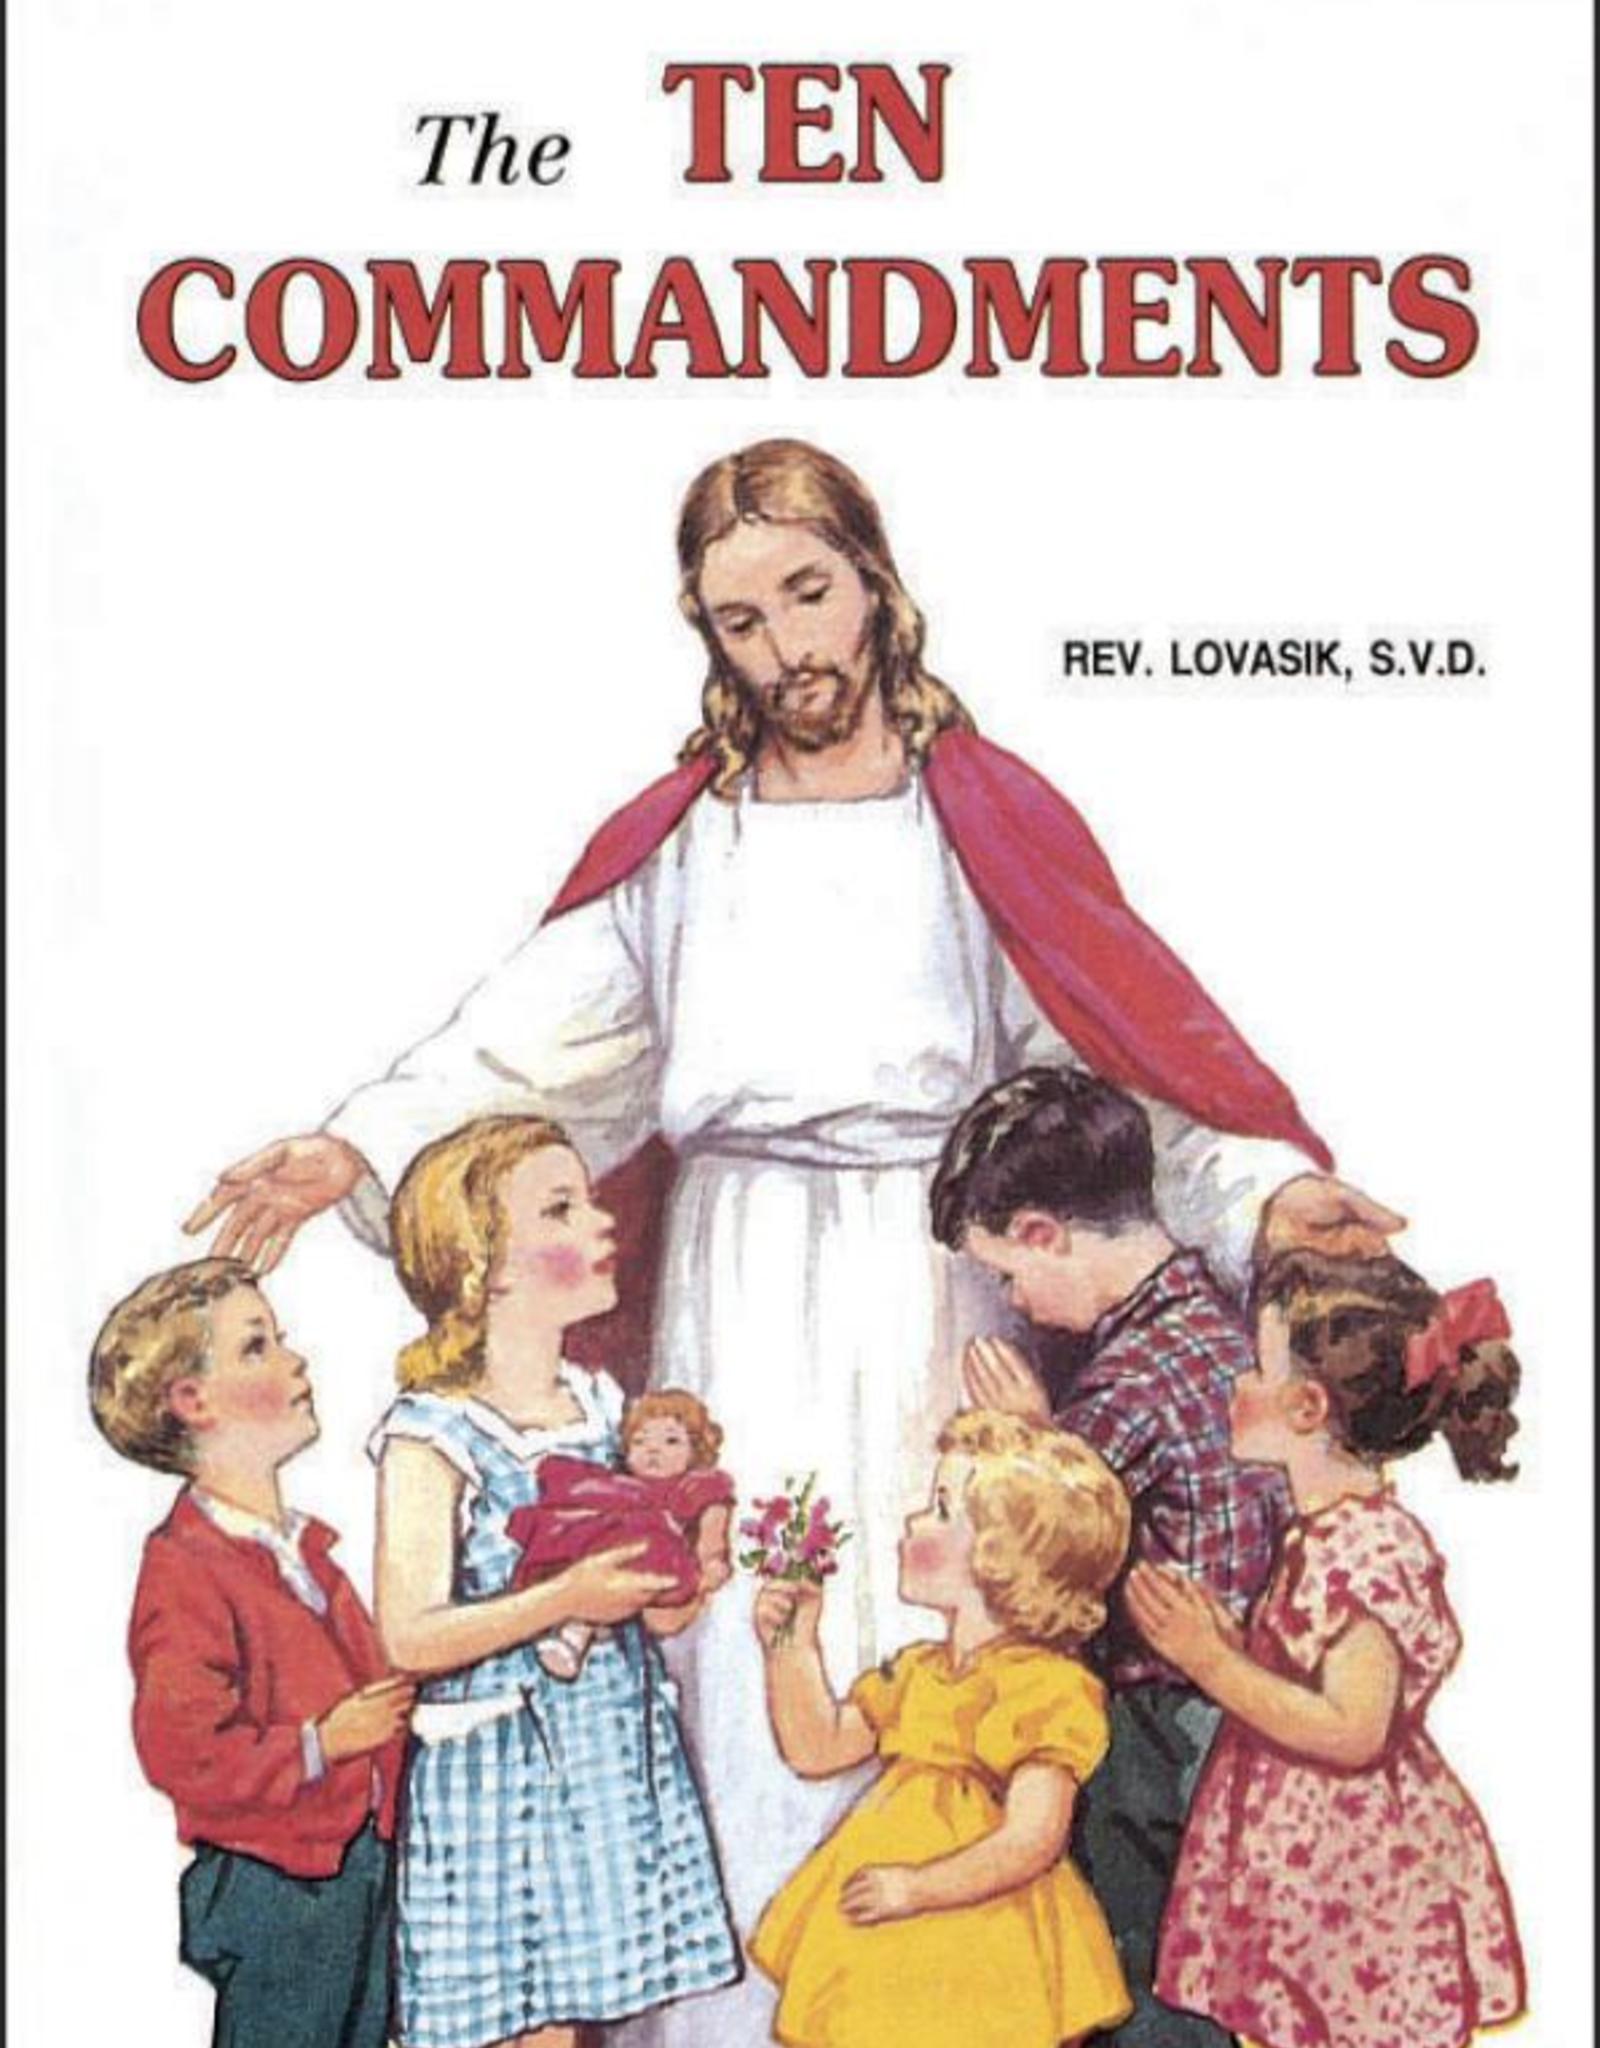 Catholic Book Publishing The Ten Commandments, by Rev. Lawrence Lovasik